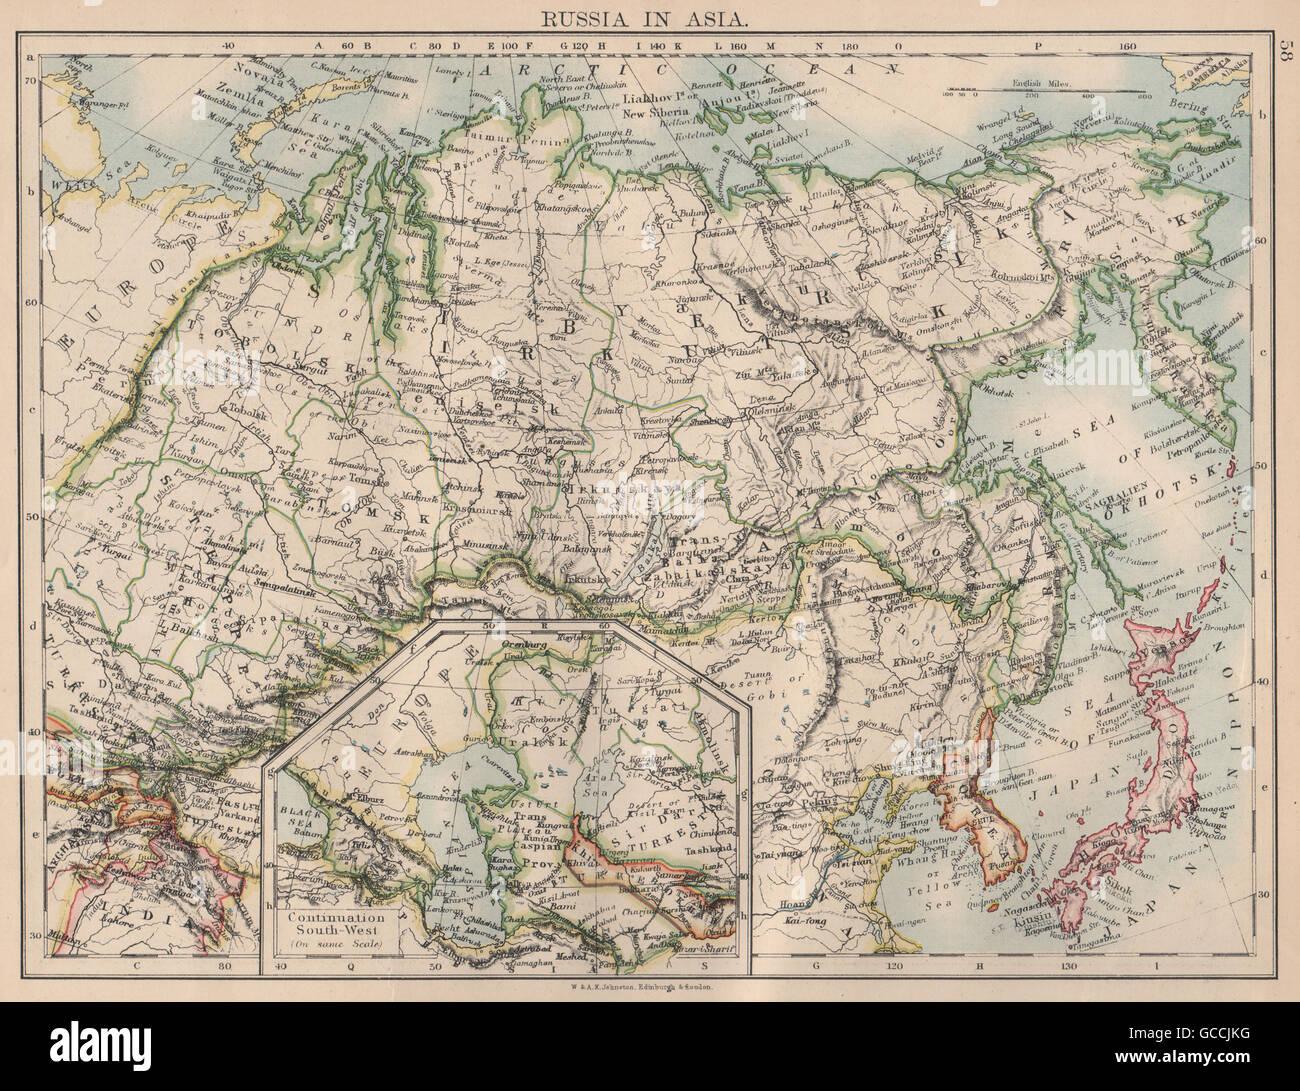 RUSSIA IN ASIA Siberia Central Asia Caspian Sea Irkutsk JOHNSTON